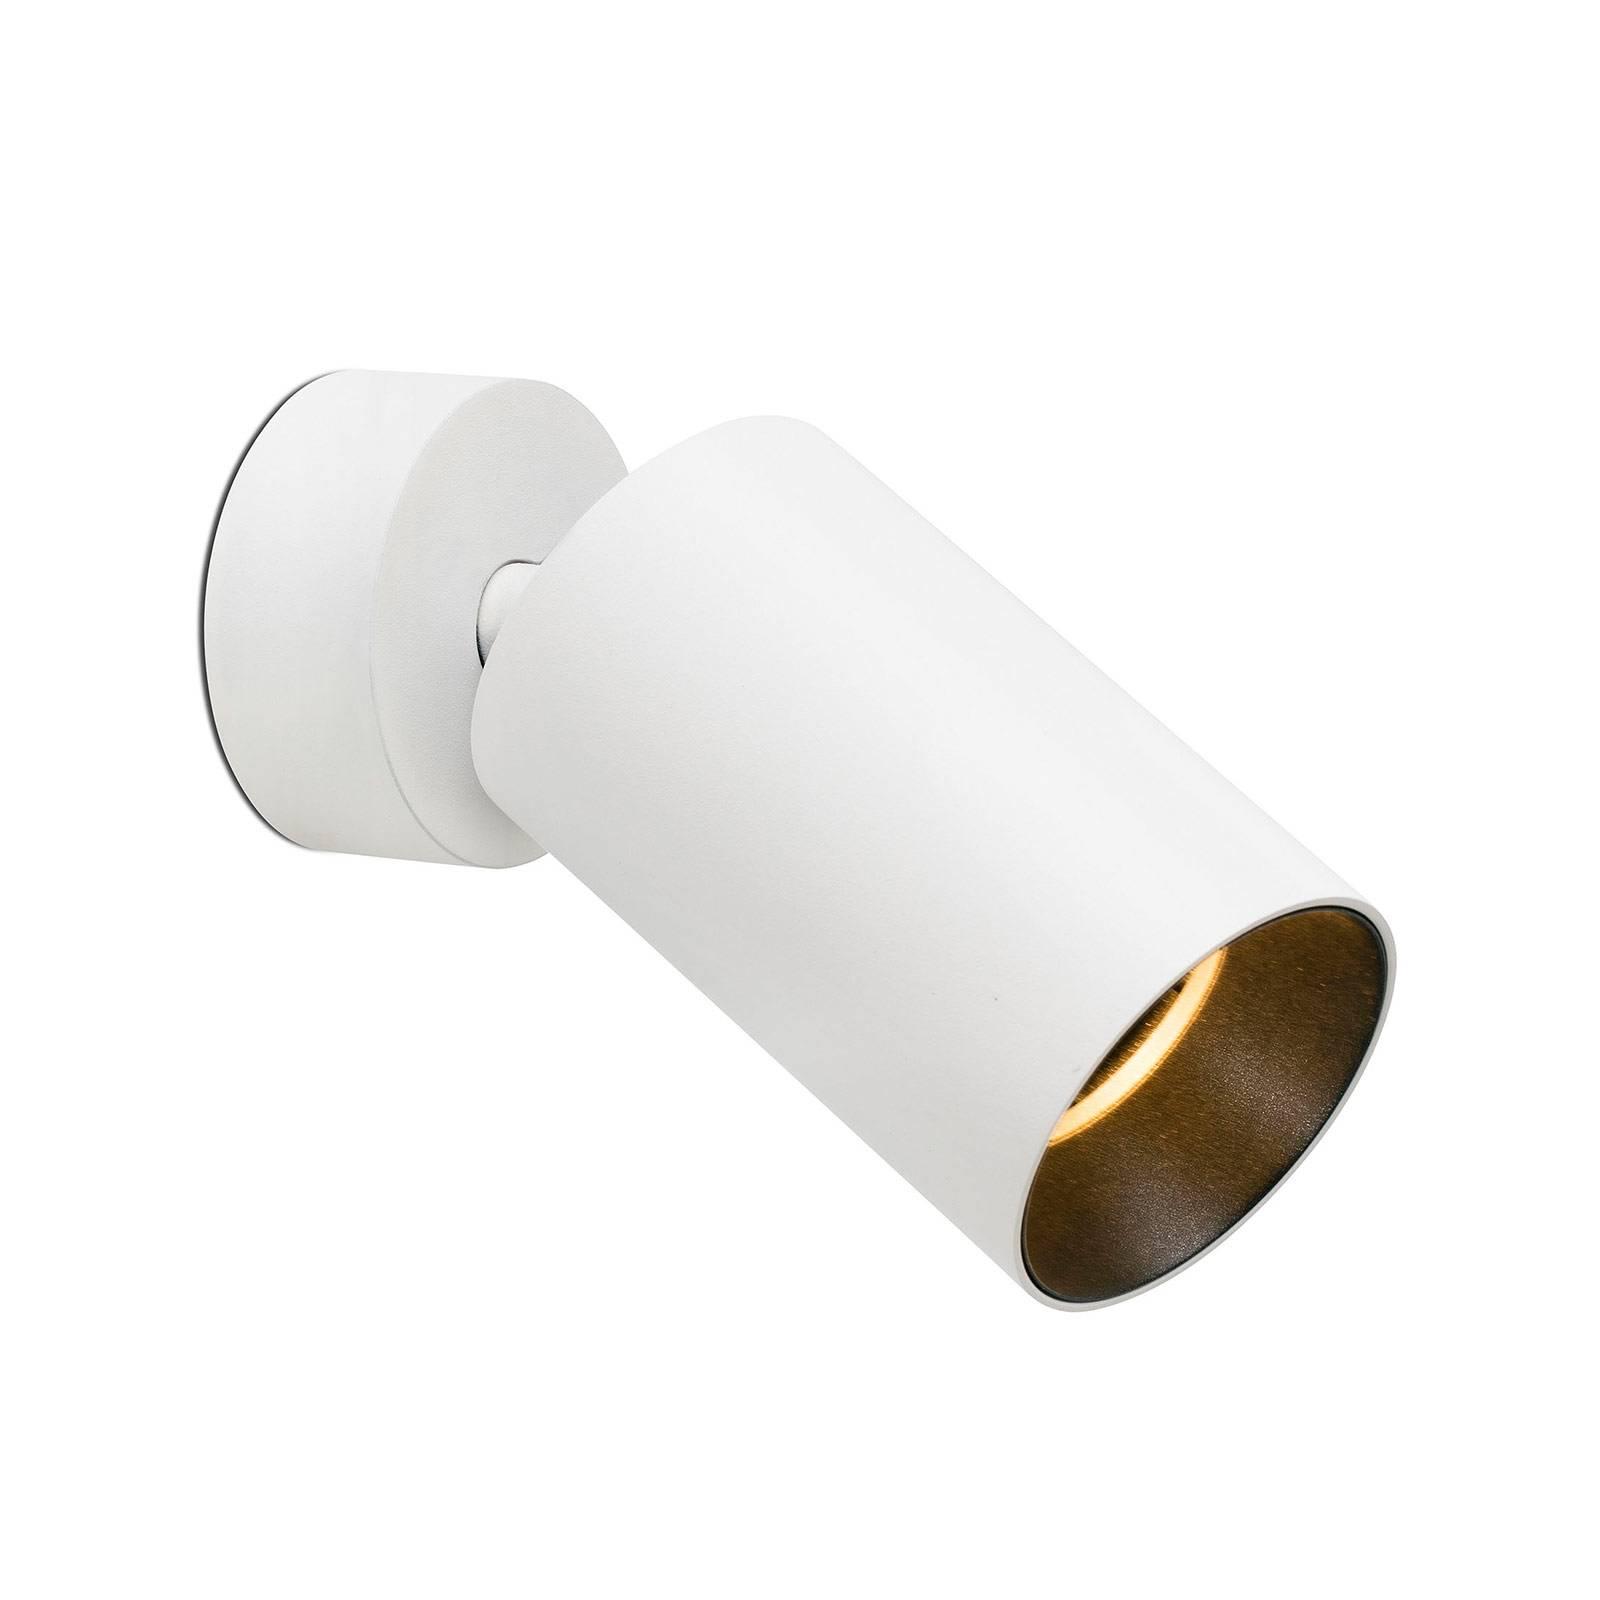 LED-kohdevalo Stan, valkoinen